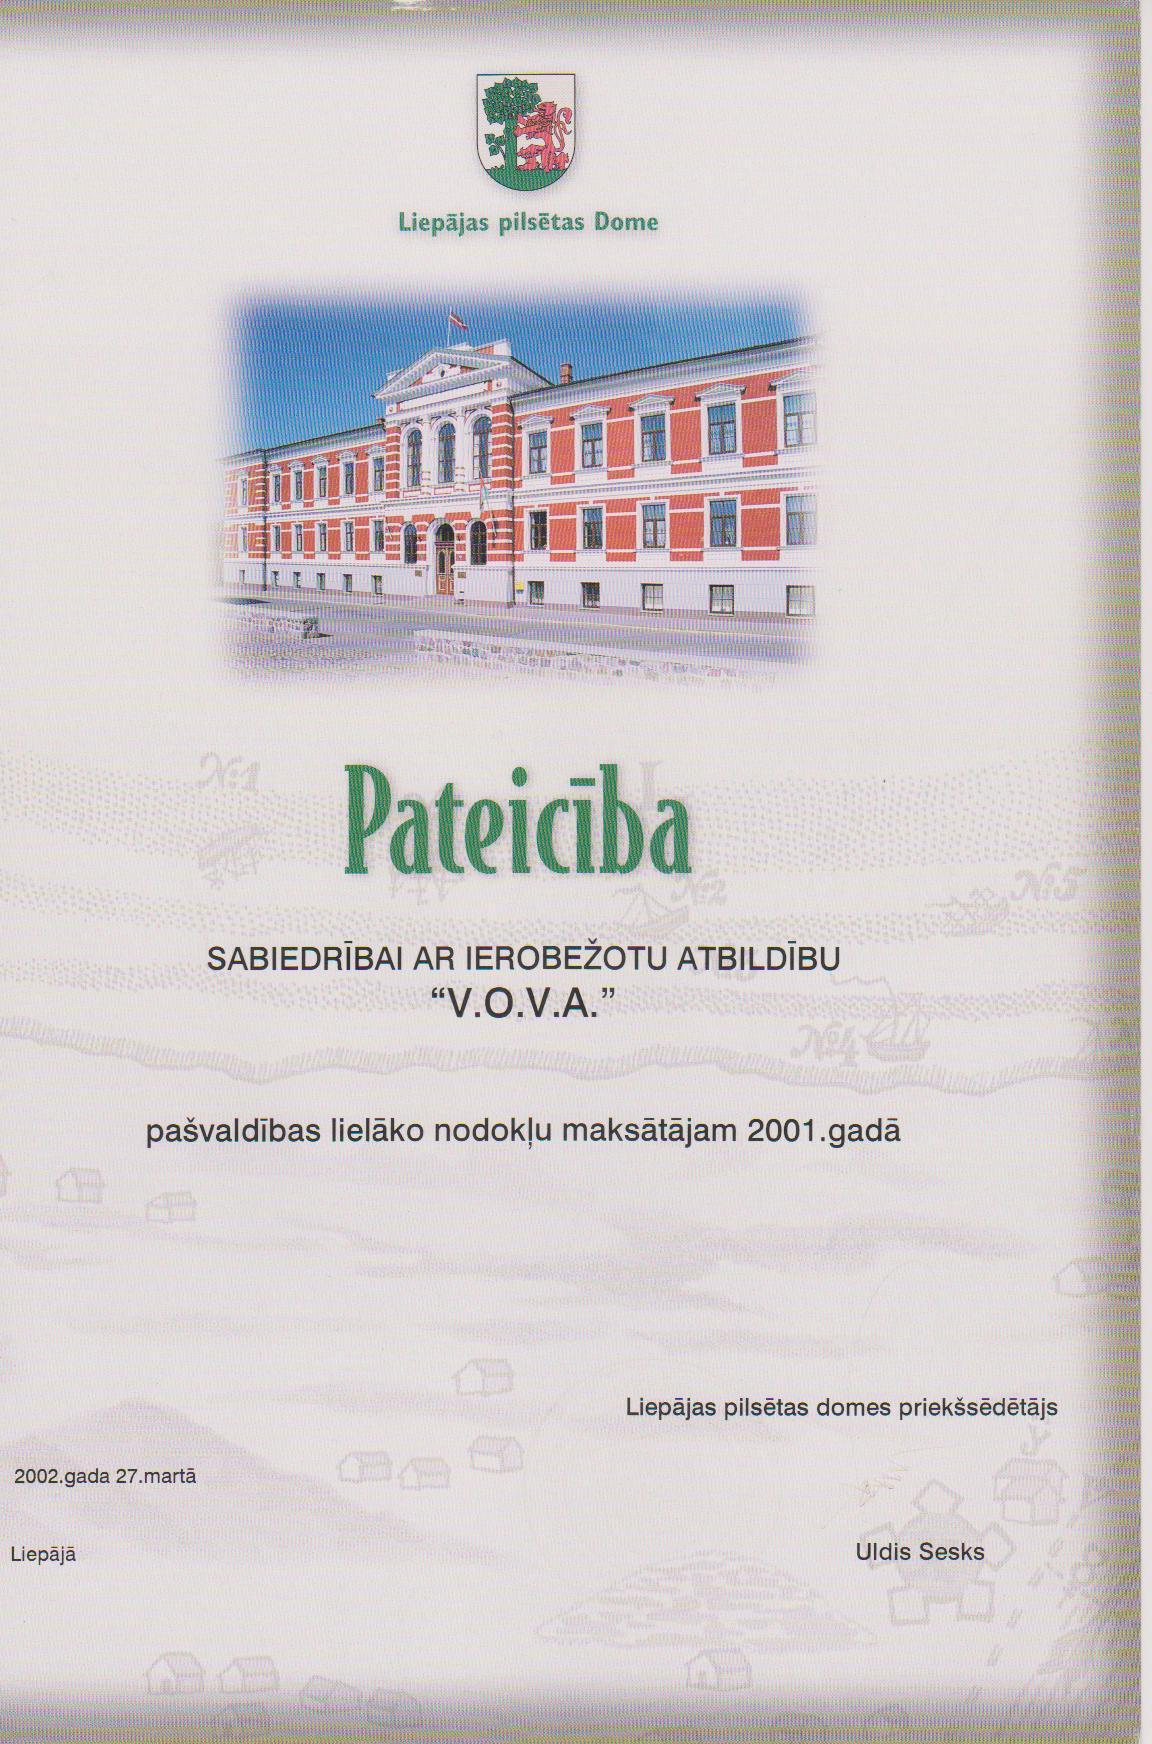 phocagallery